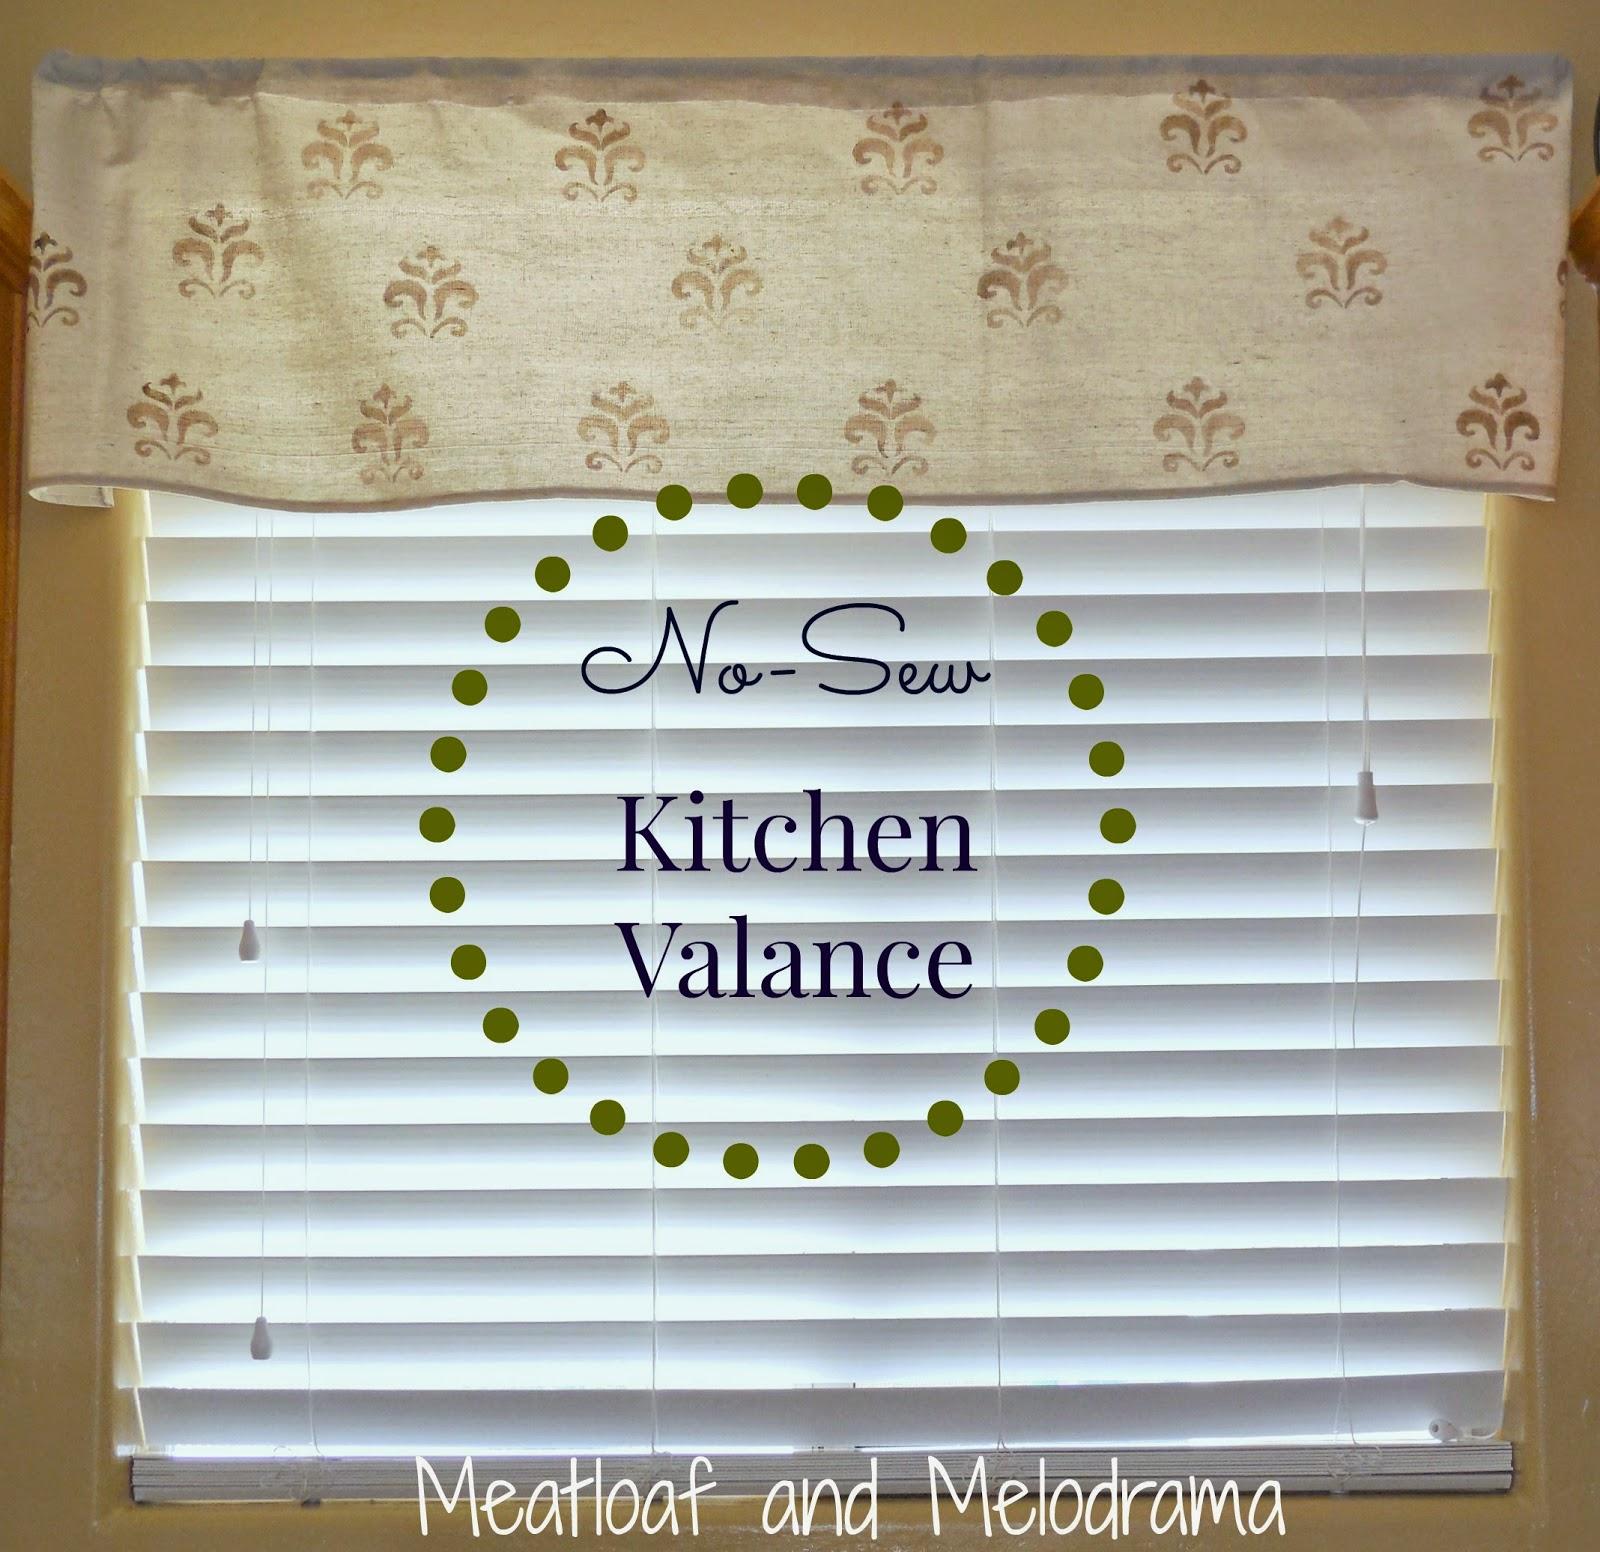 Meatloaf And Melodrama: Easy No-Sew Kitchen Valances